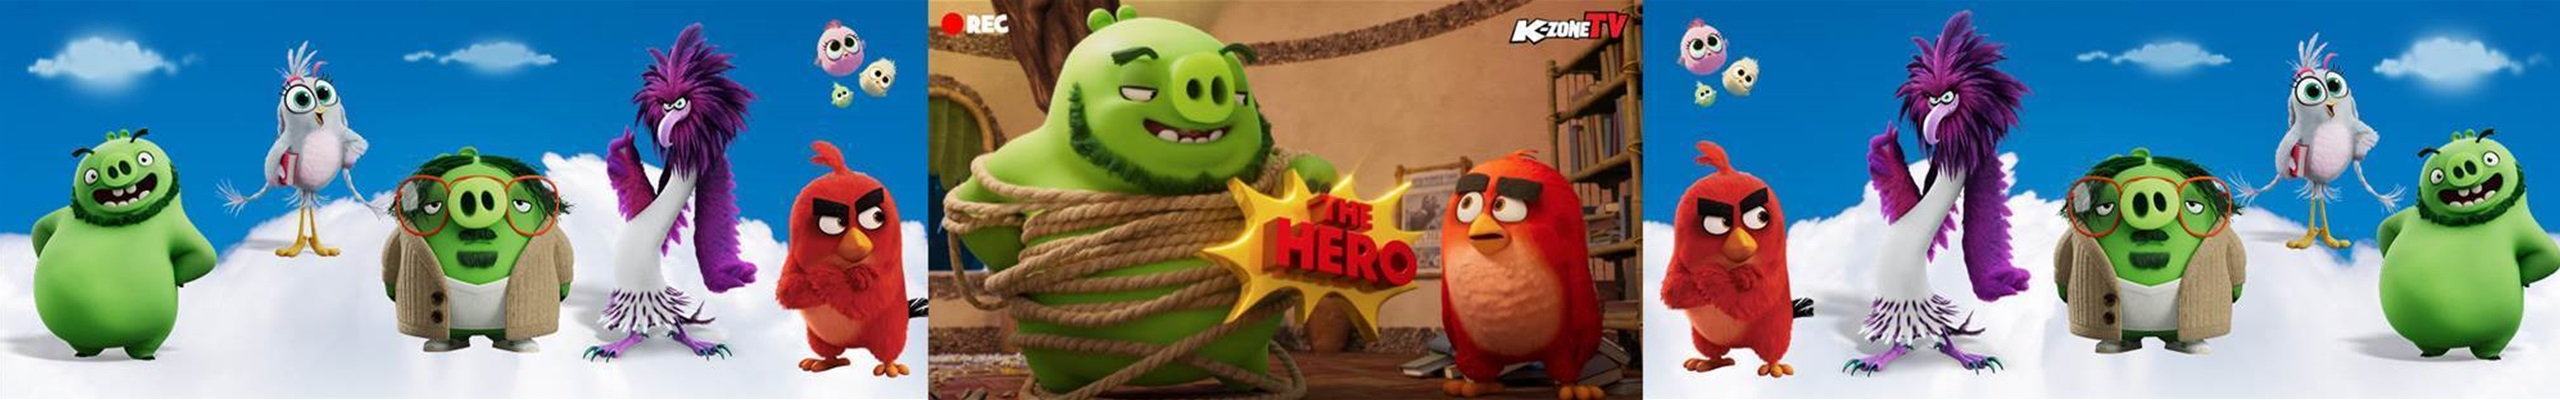 The Angry Birds Movie 2 Trailer | Frenemies Unite